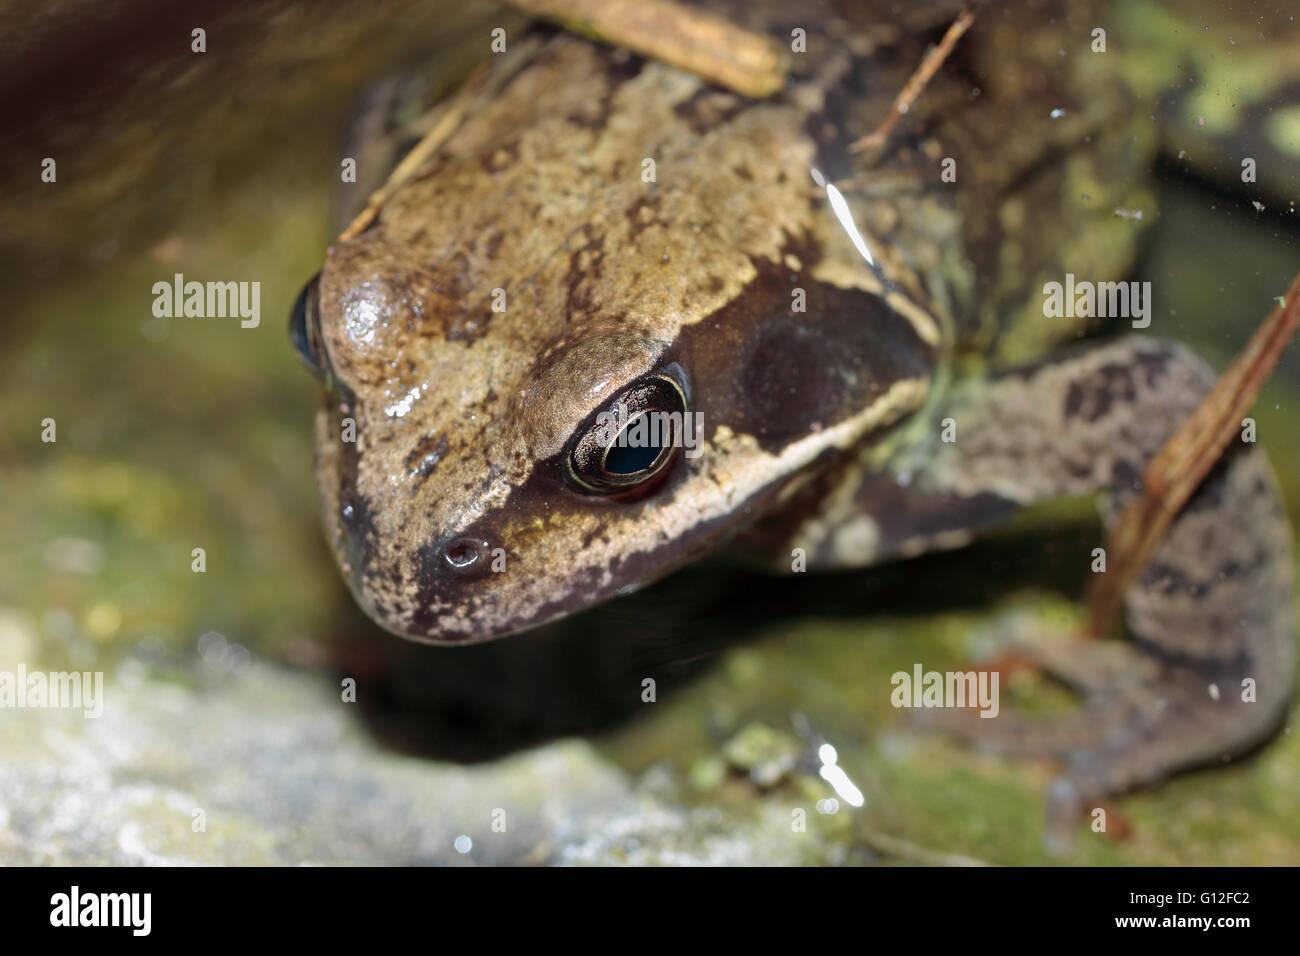 Anglais Common frog Rana temporaria dans un étang de jardin Banque D'Images